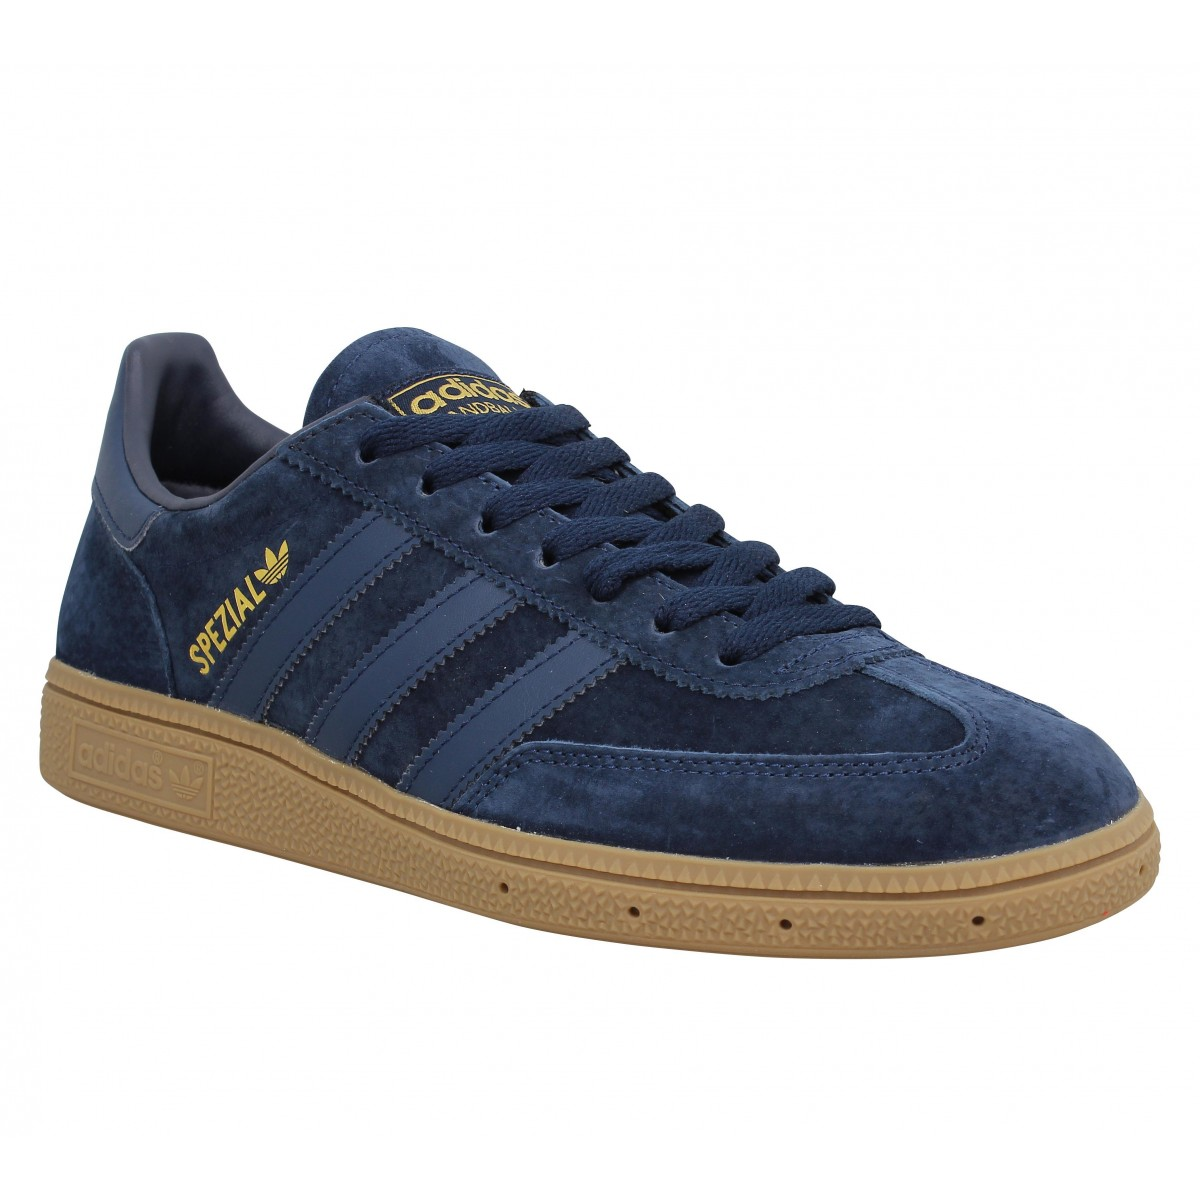 adidas spezial bleu marine,Homme Adidas Spezial Fonce marine